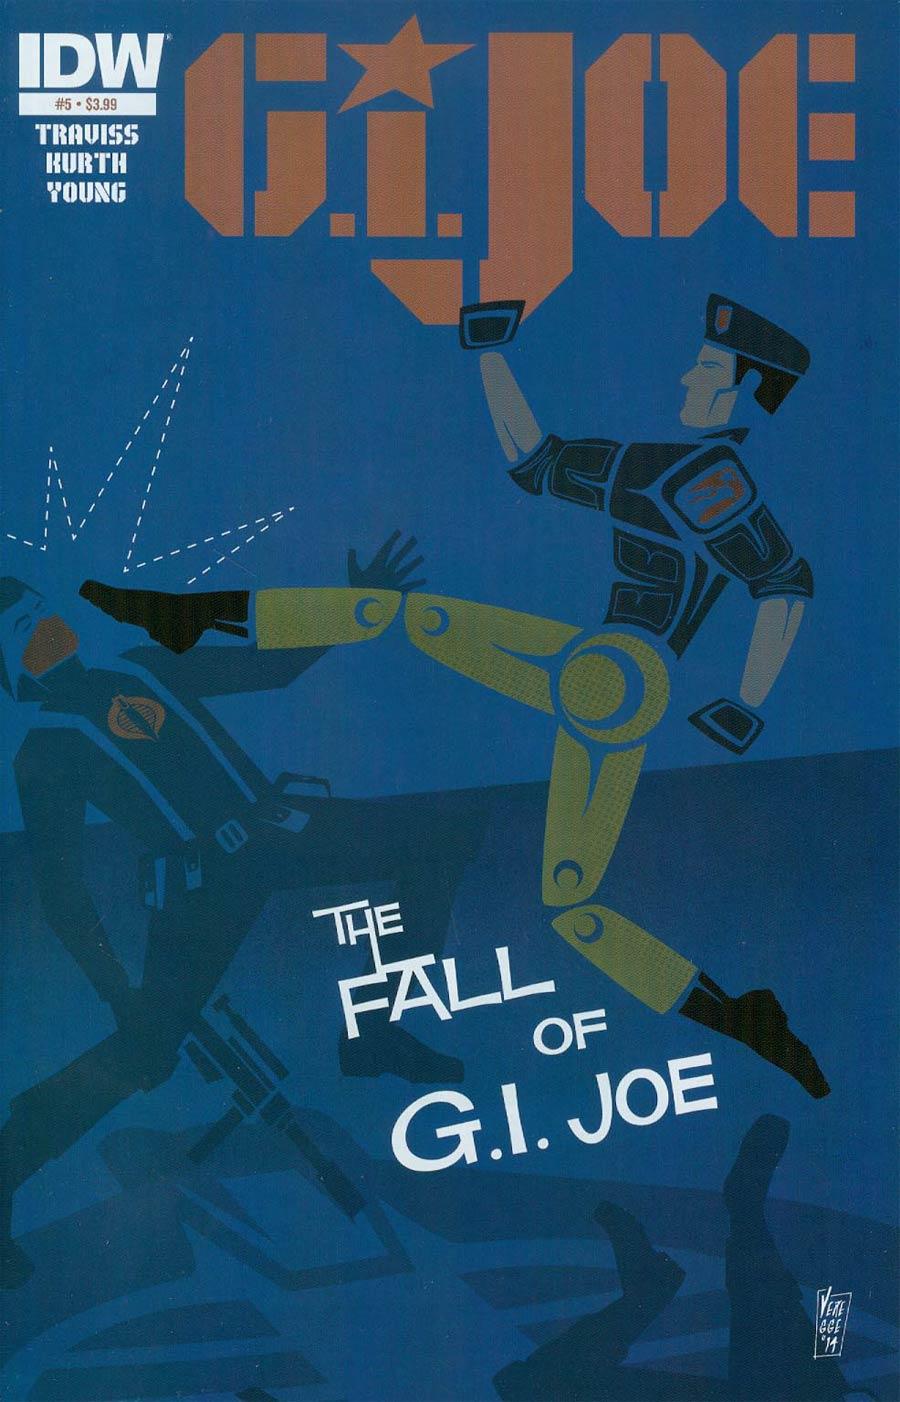 GI Joe Vol 7 #5 Cover A Regular Jeffrey Veregge Cover